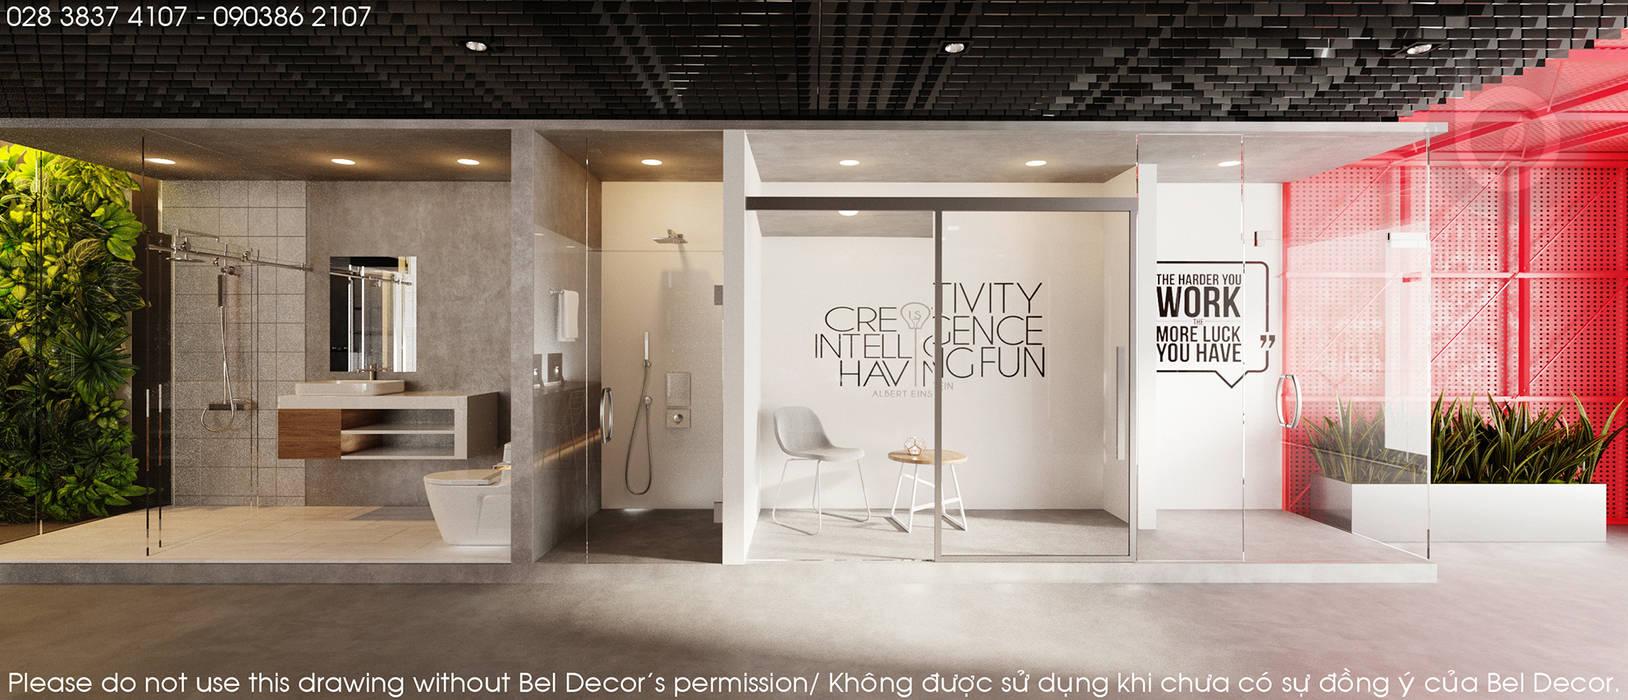 Thiết Kế Nội Thất Showroom (Sh1801):   by Bel Decor